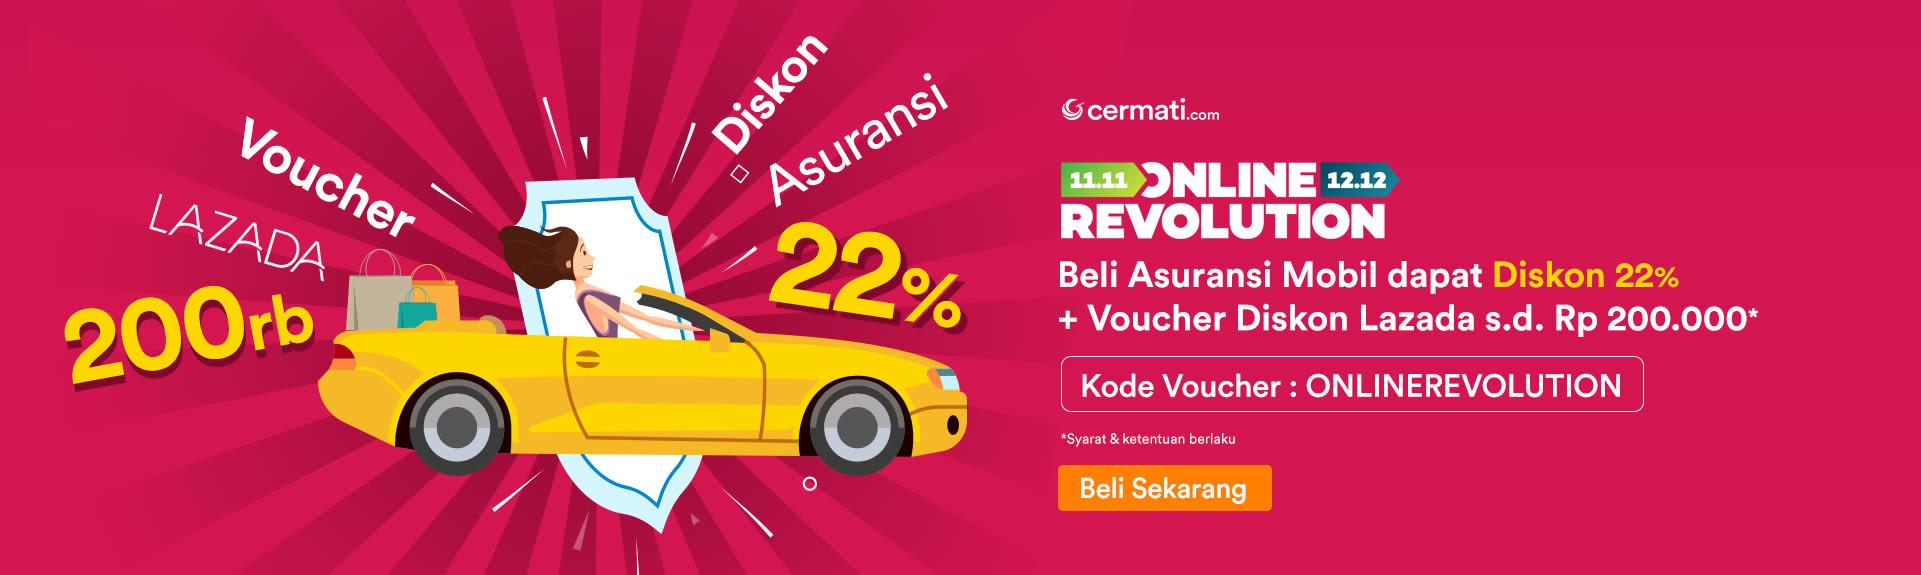 Diskon Asuransi Mobil 22% - Online Revolution